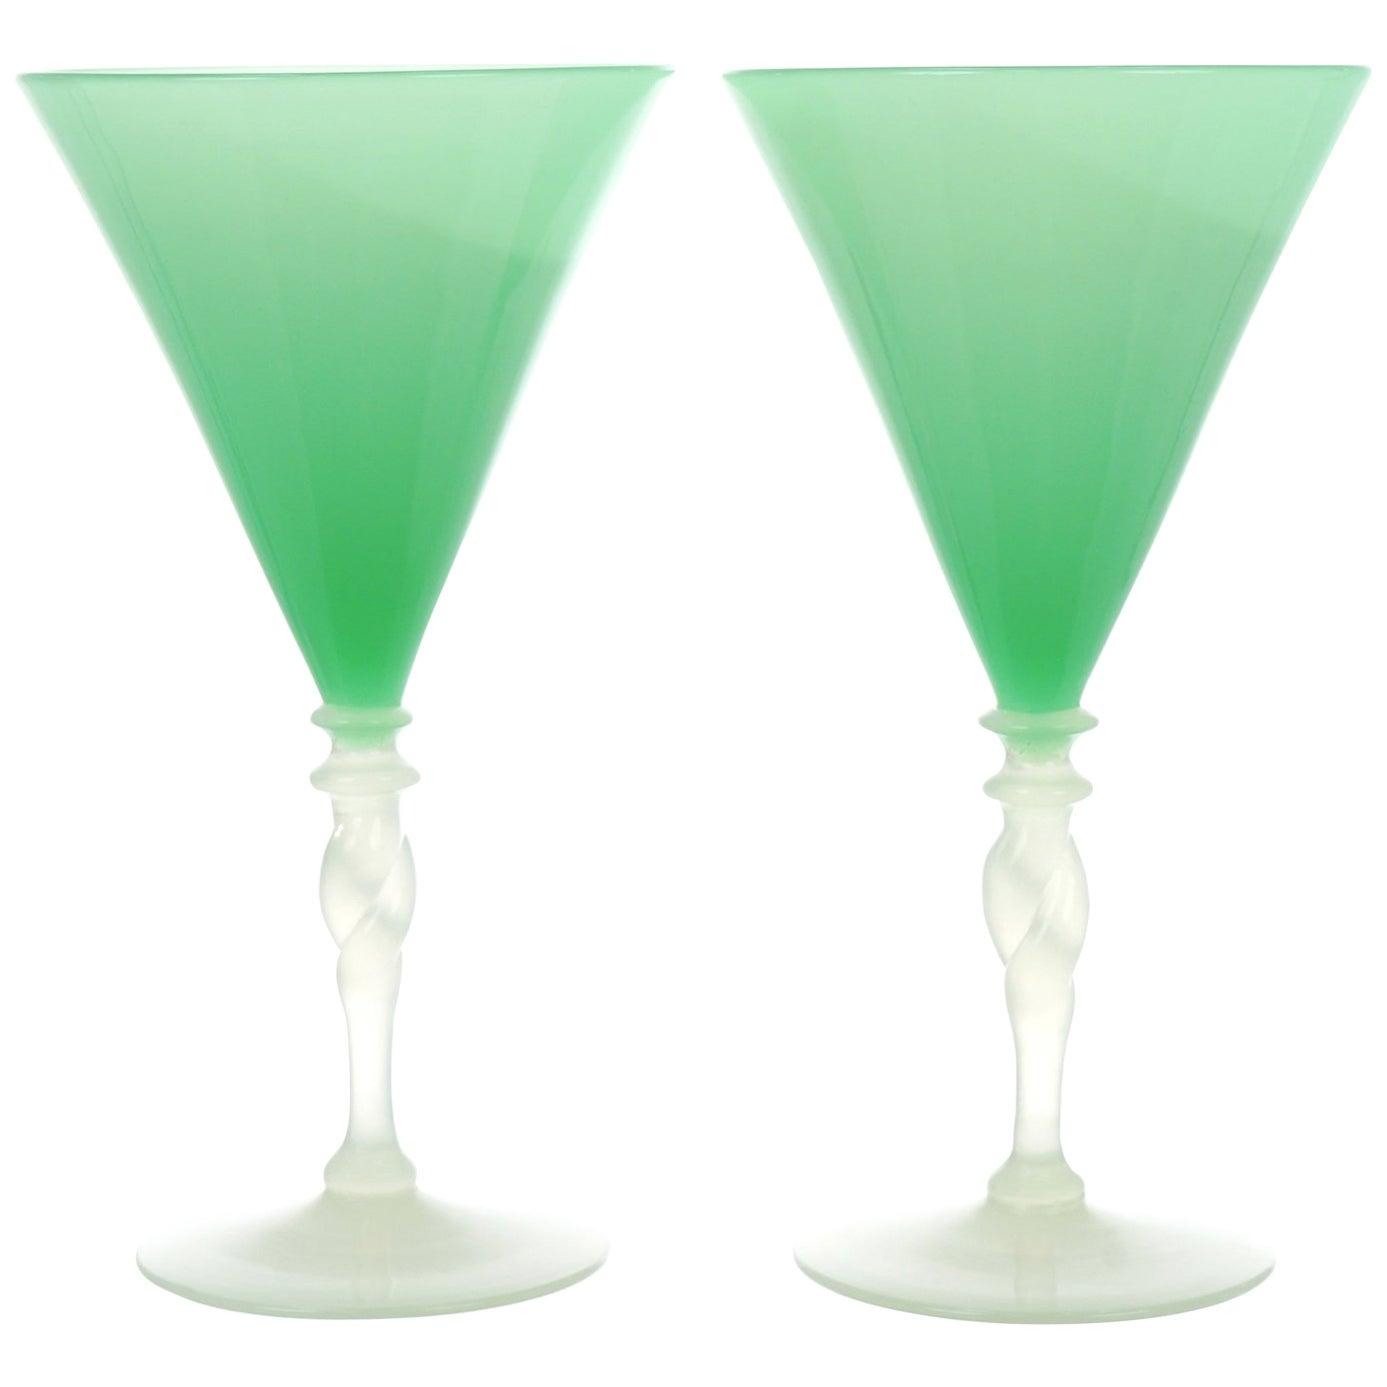 12 Steuben Art Deco Jade and Alabaster Water Goblets